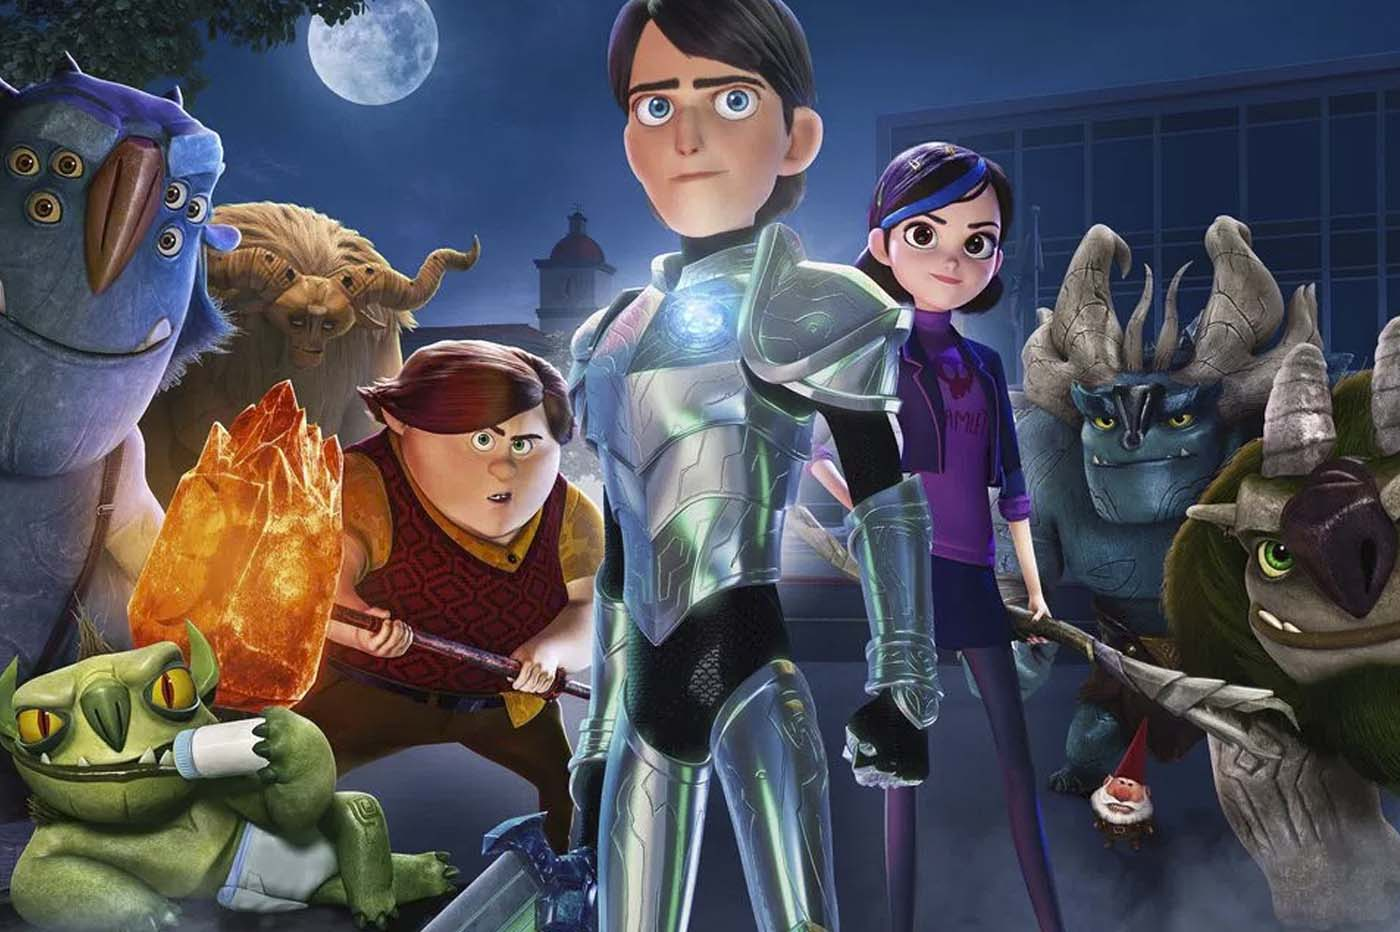 crítica Trollhunters Dibujos animados